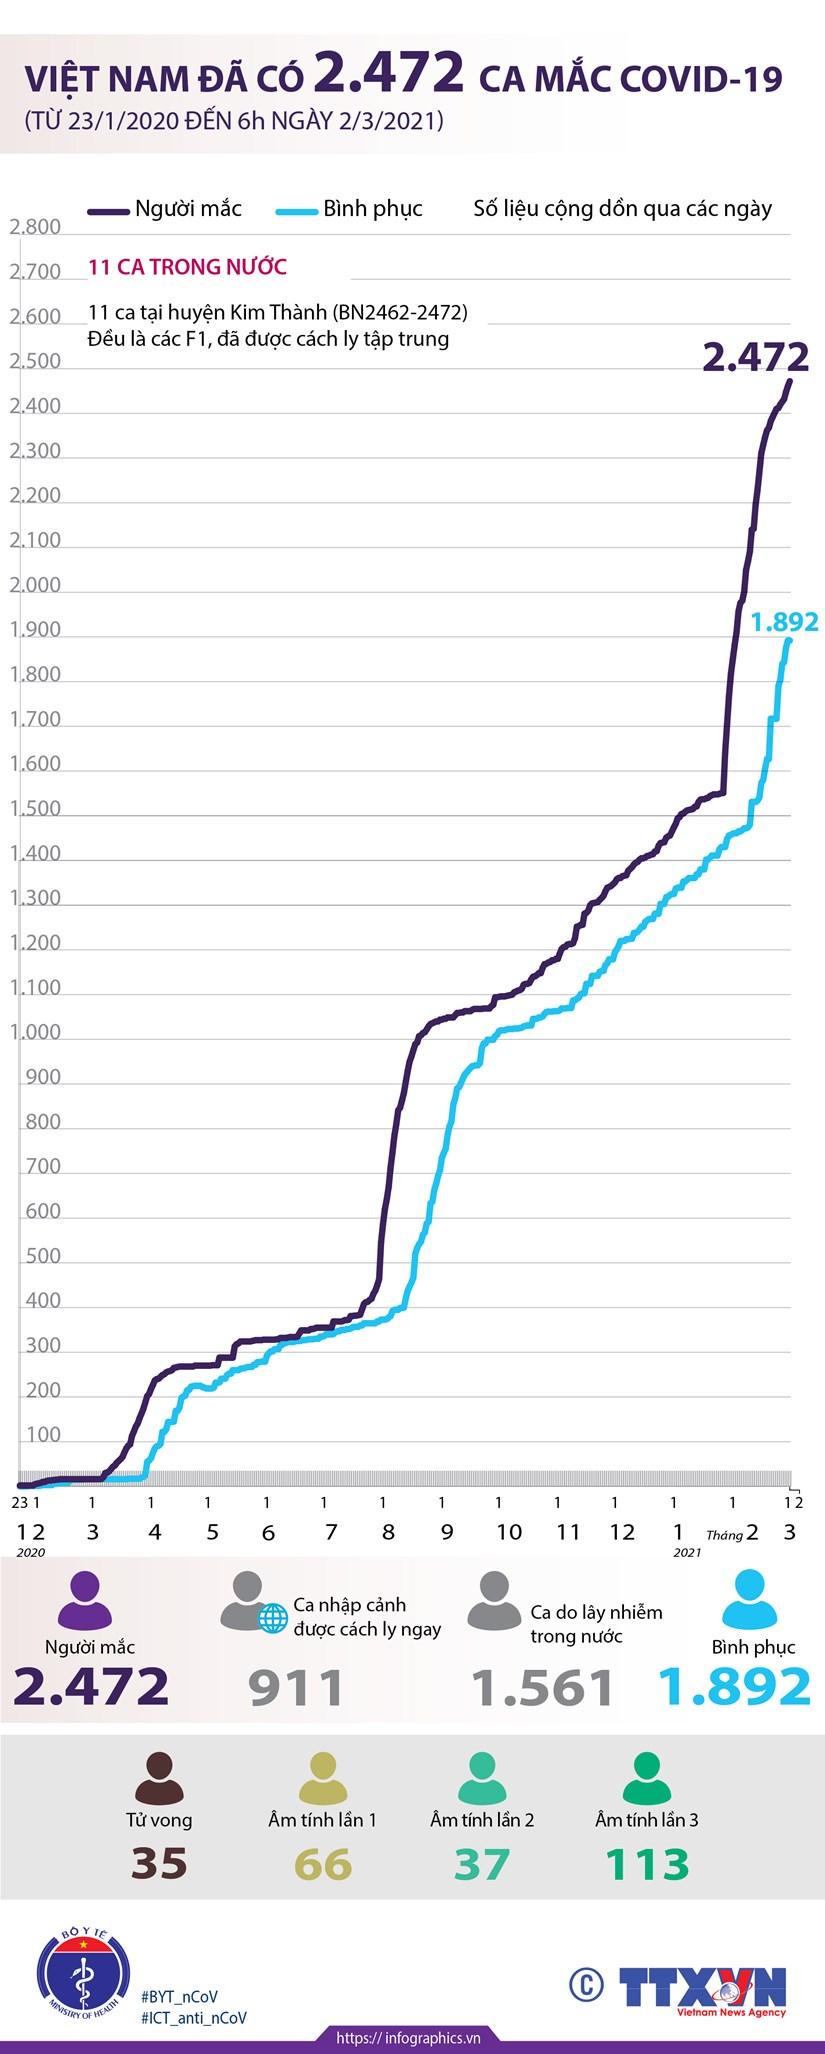 [Infographics] Viet Nam da ghi nhan 2.472 ca mac COVID-19 hinh anh 1